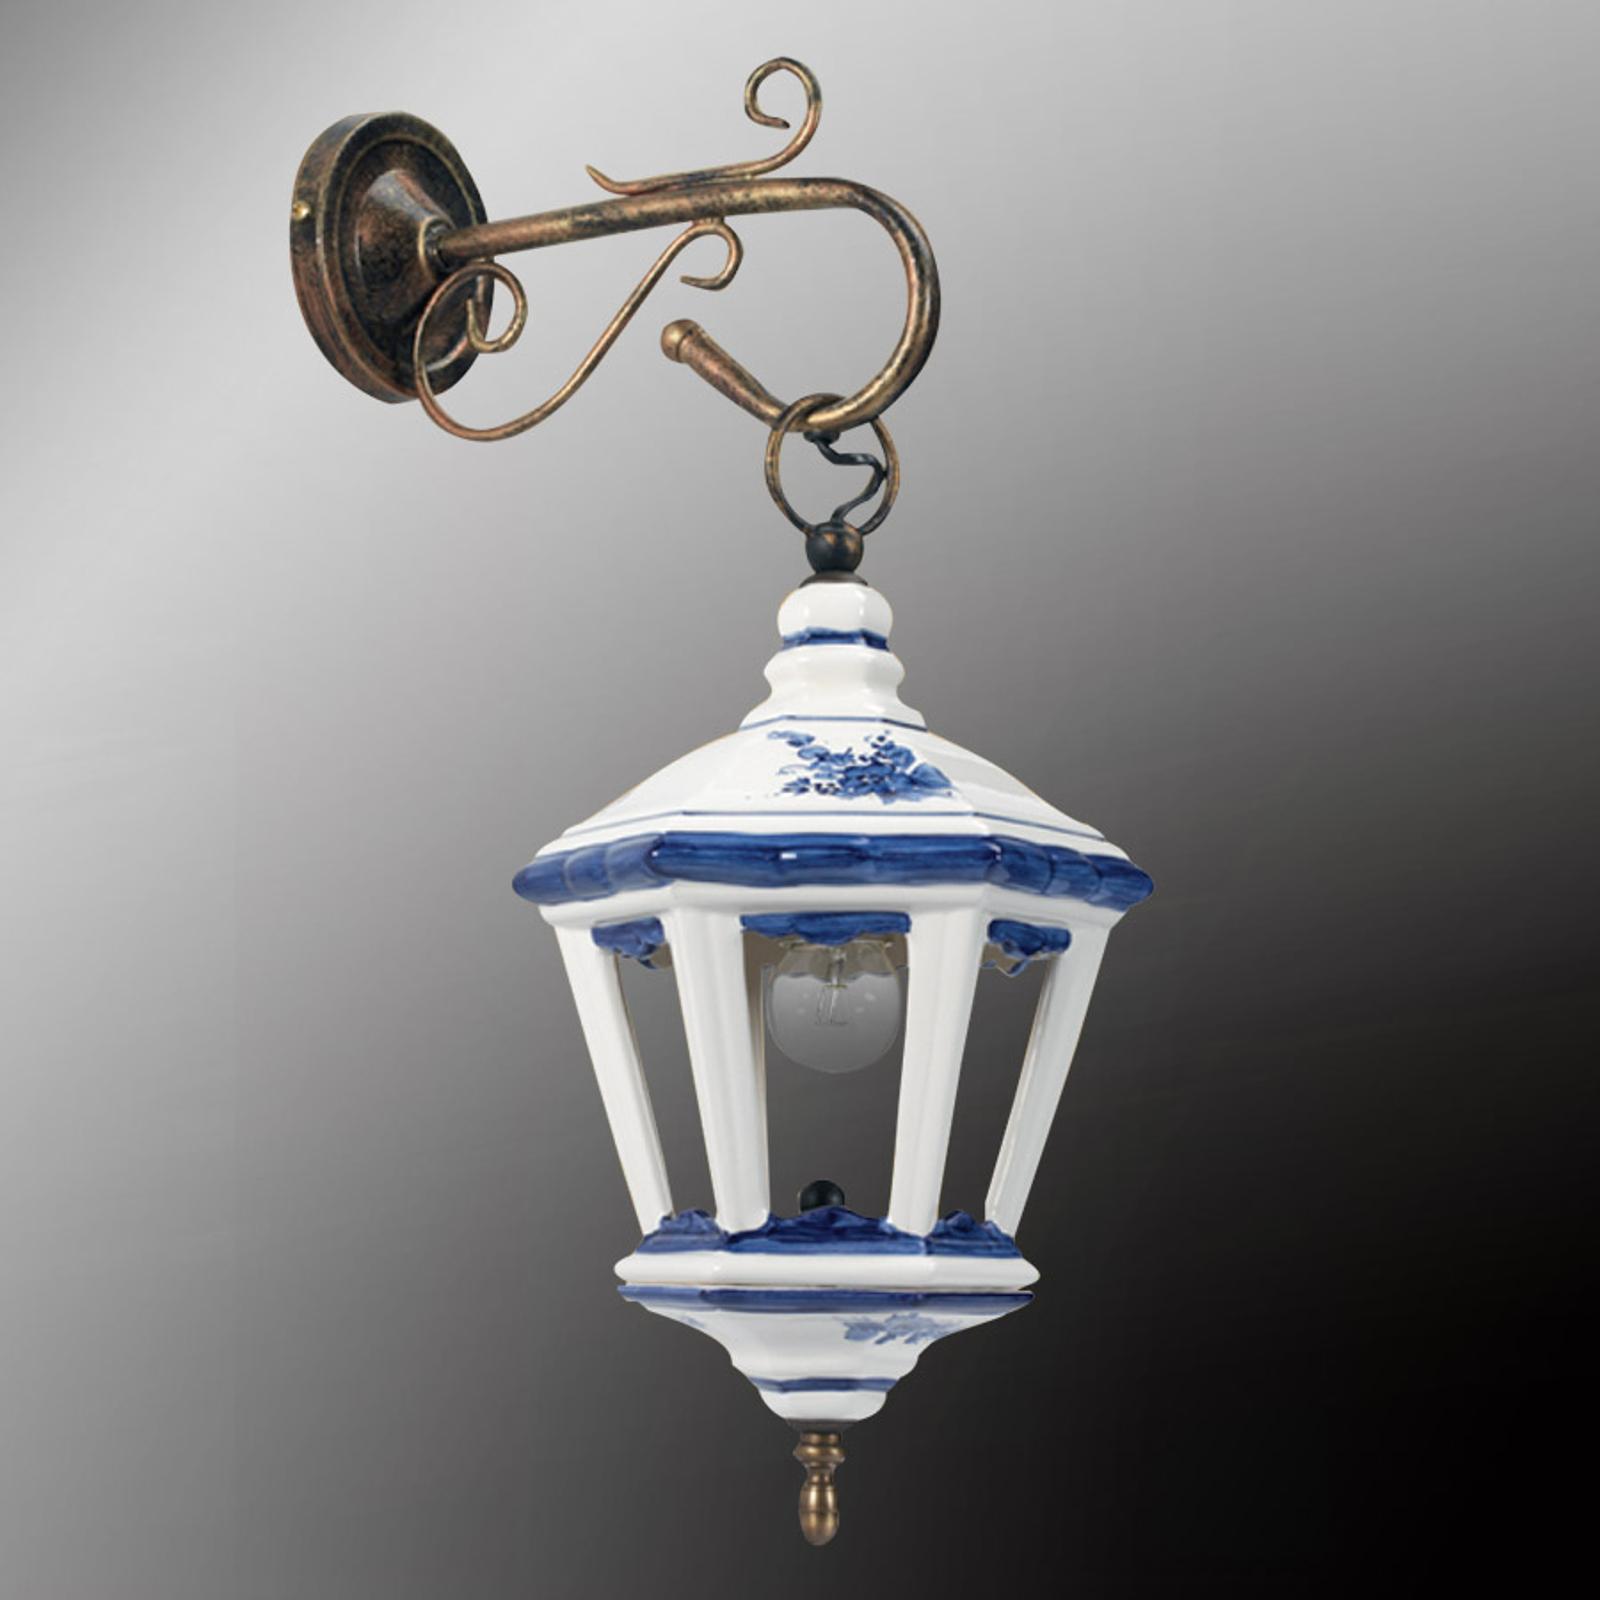 Ceramic wall light Viola - lantern_3046208_1